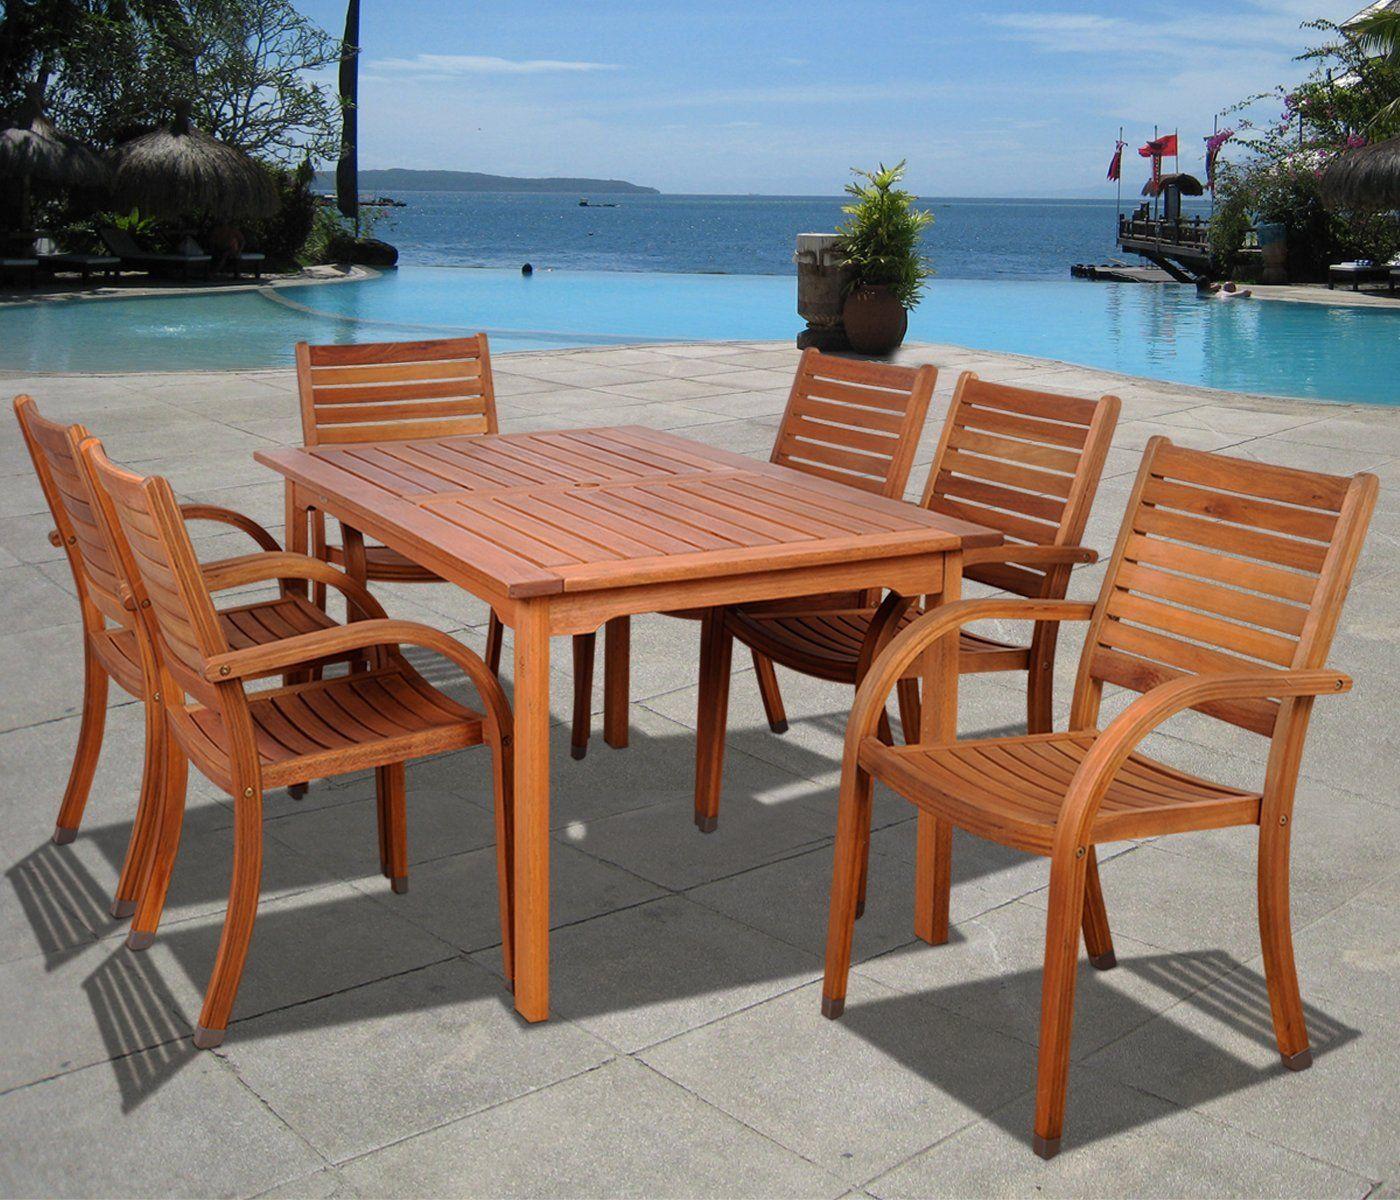 best teak patio furniture sets | pinterest | patio furniture sets